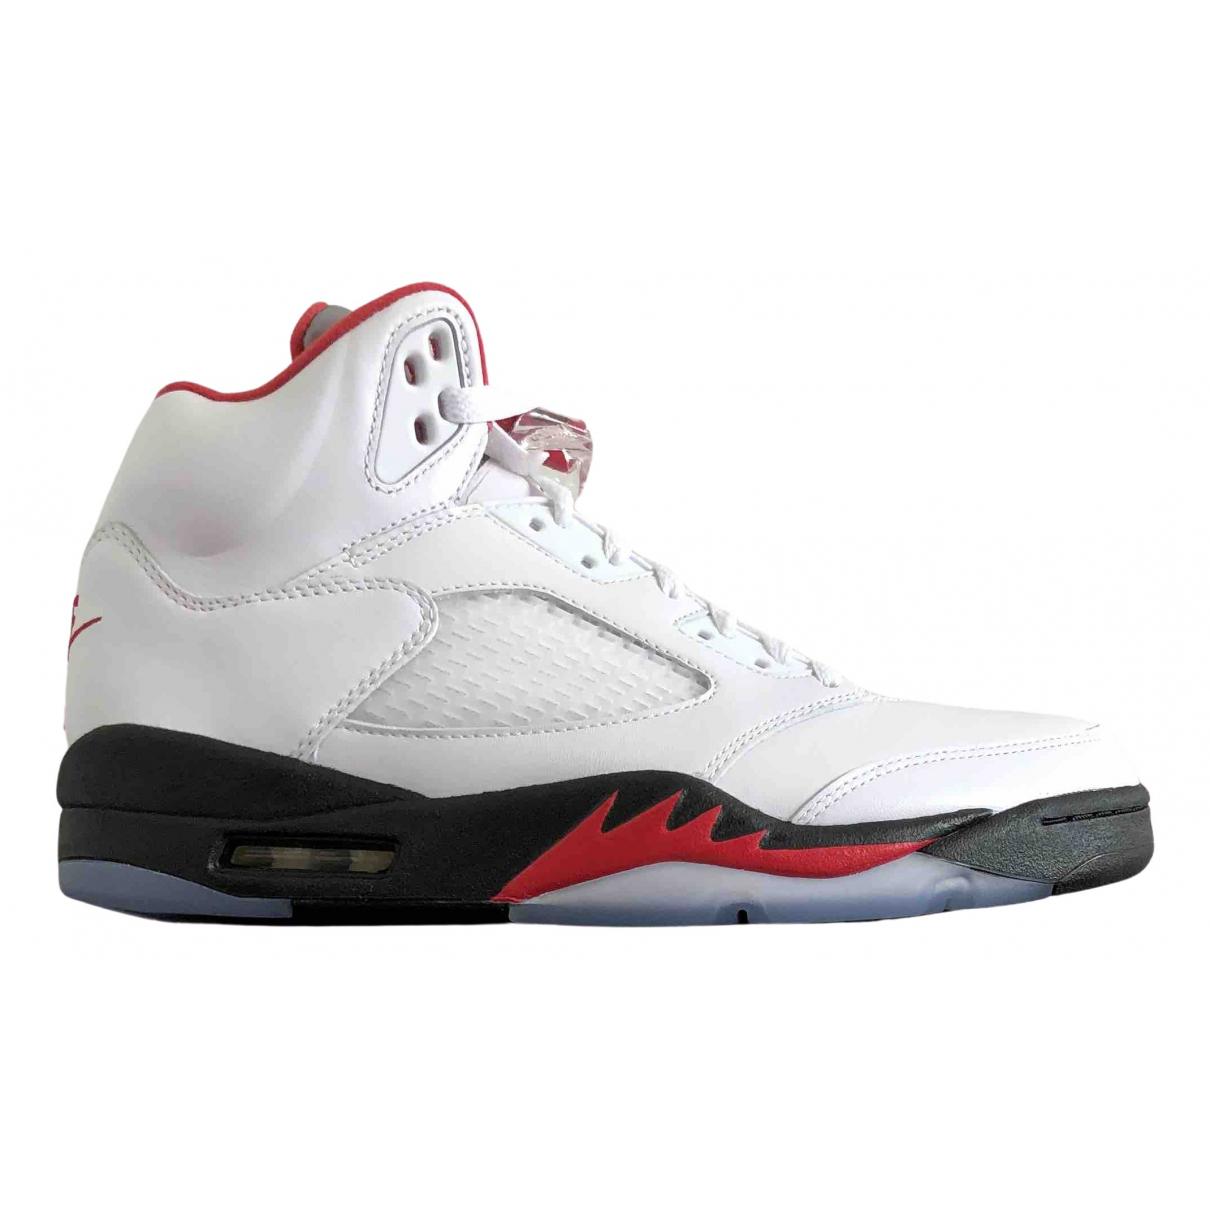 Jordan - Baskets Air Jordan 5 pour homme en cuir - blanc